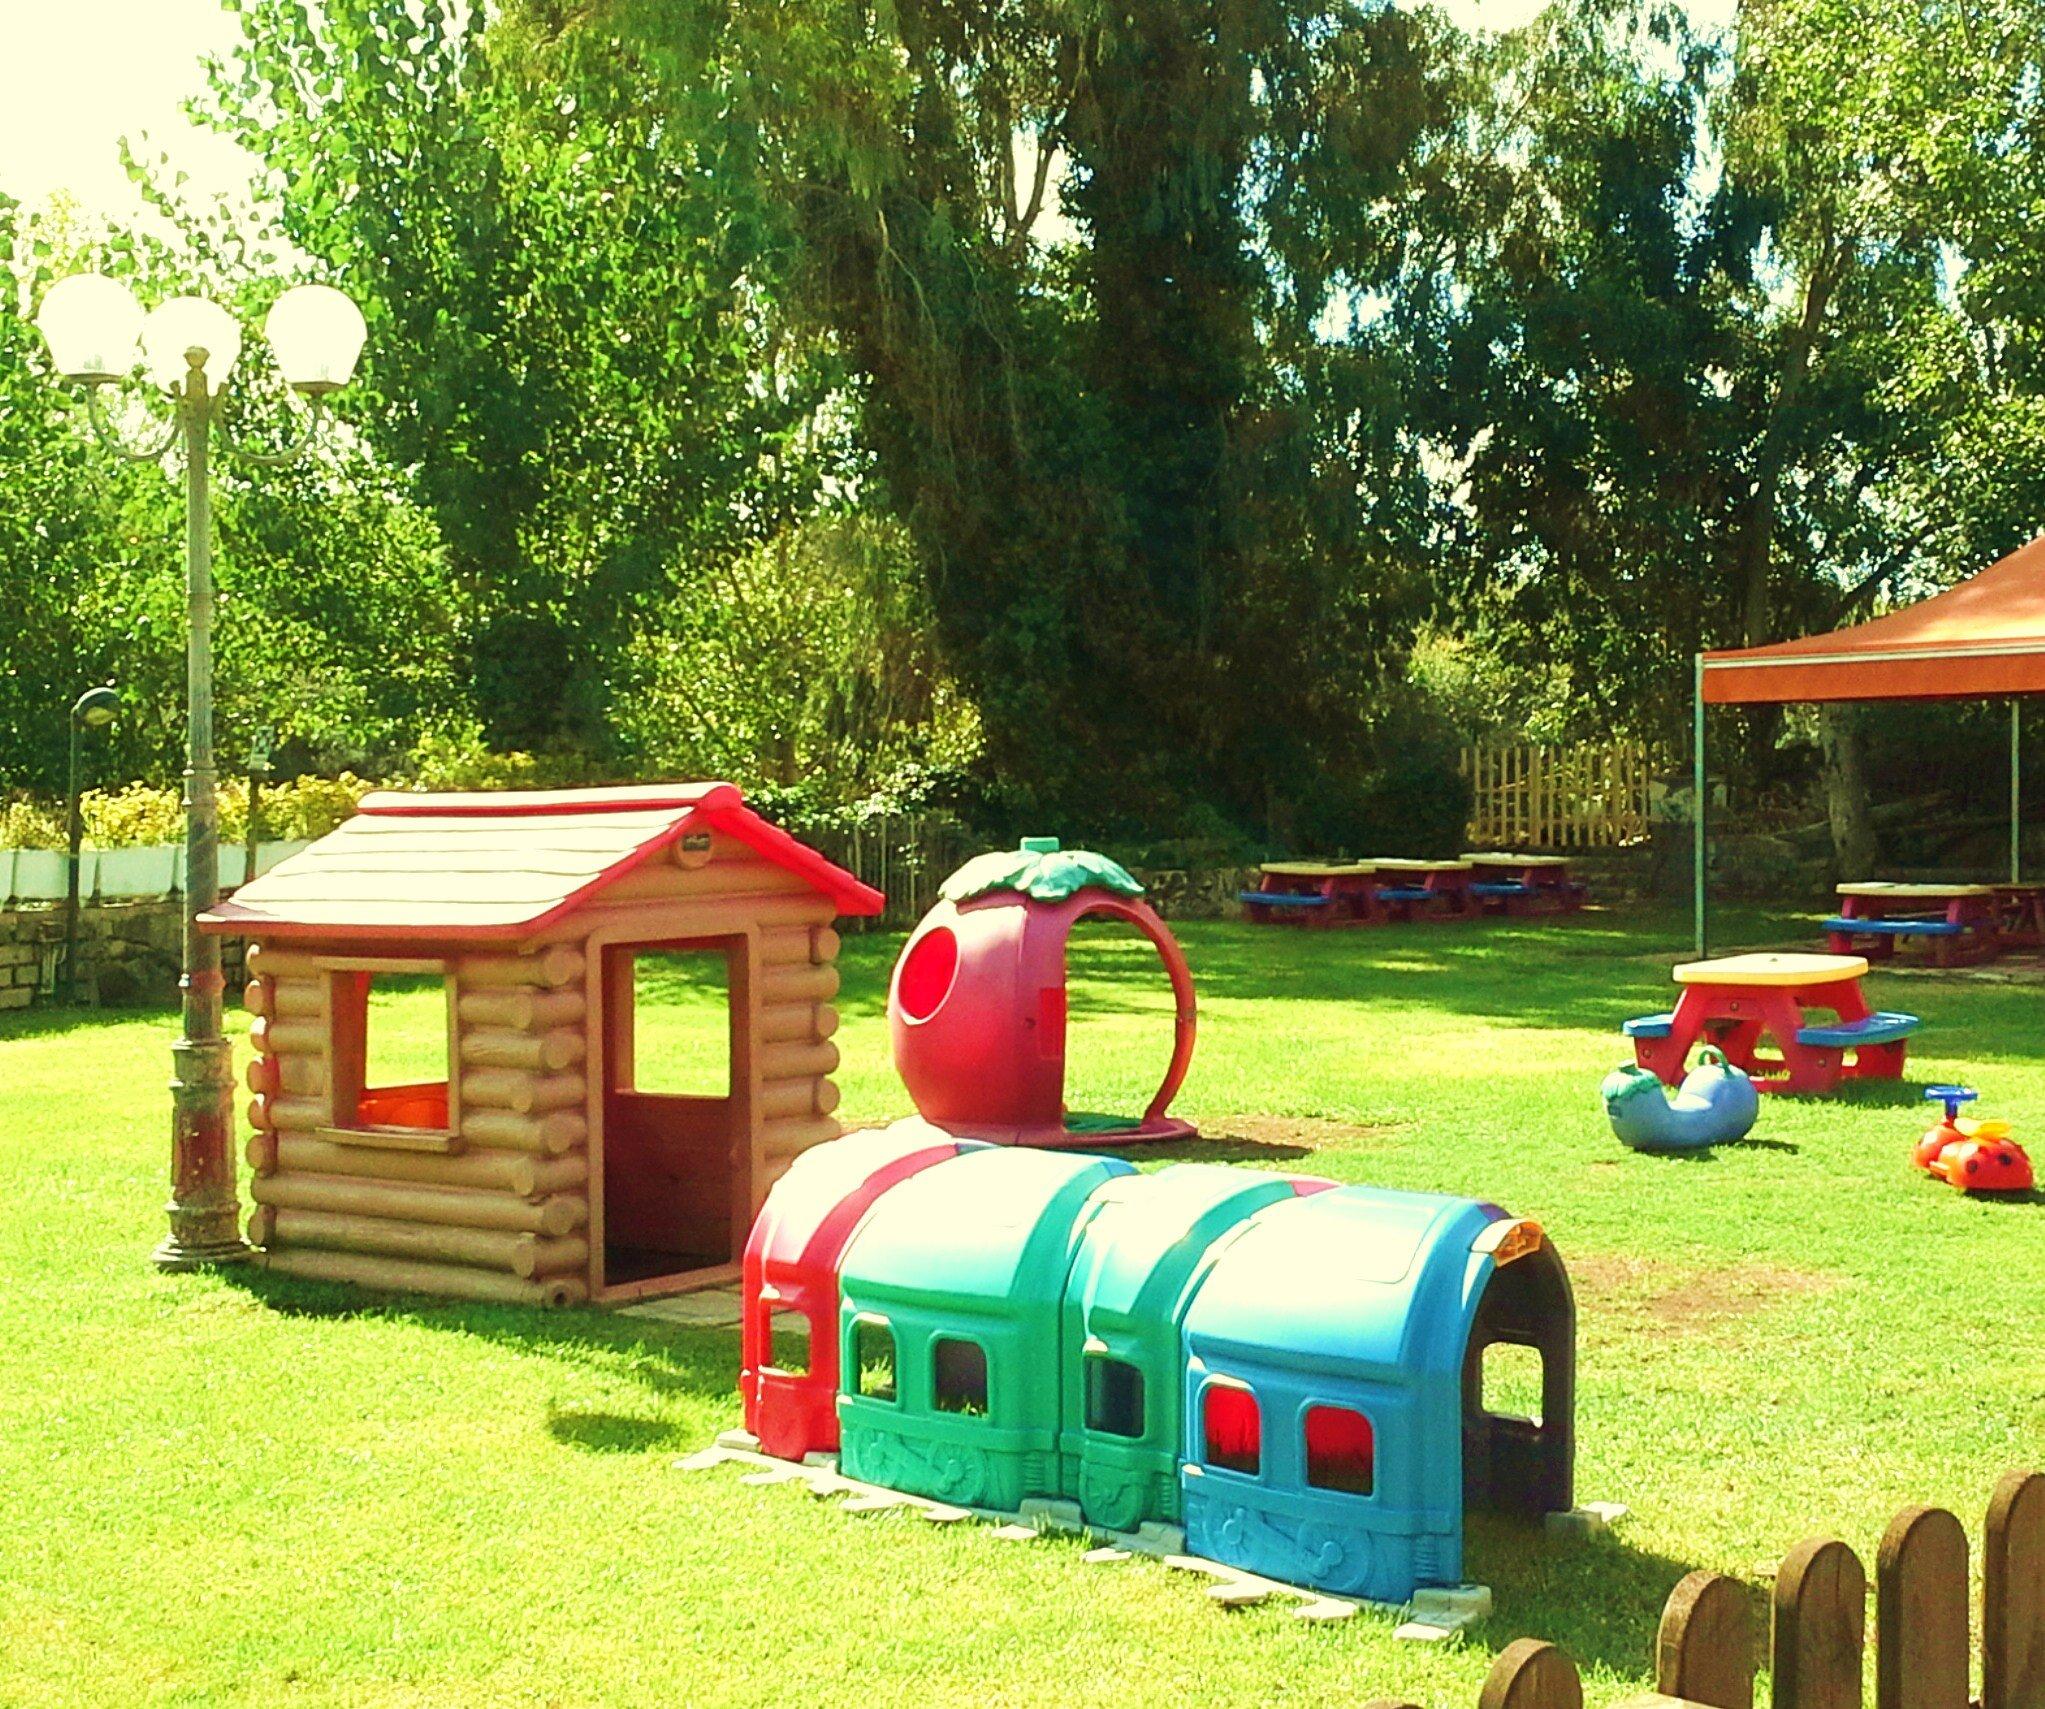 Giochi per bambini in giardino